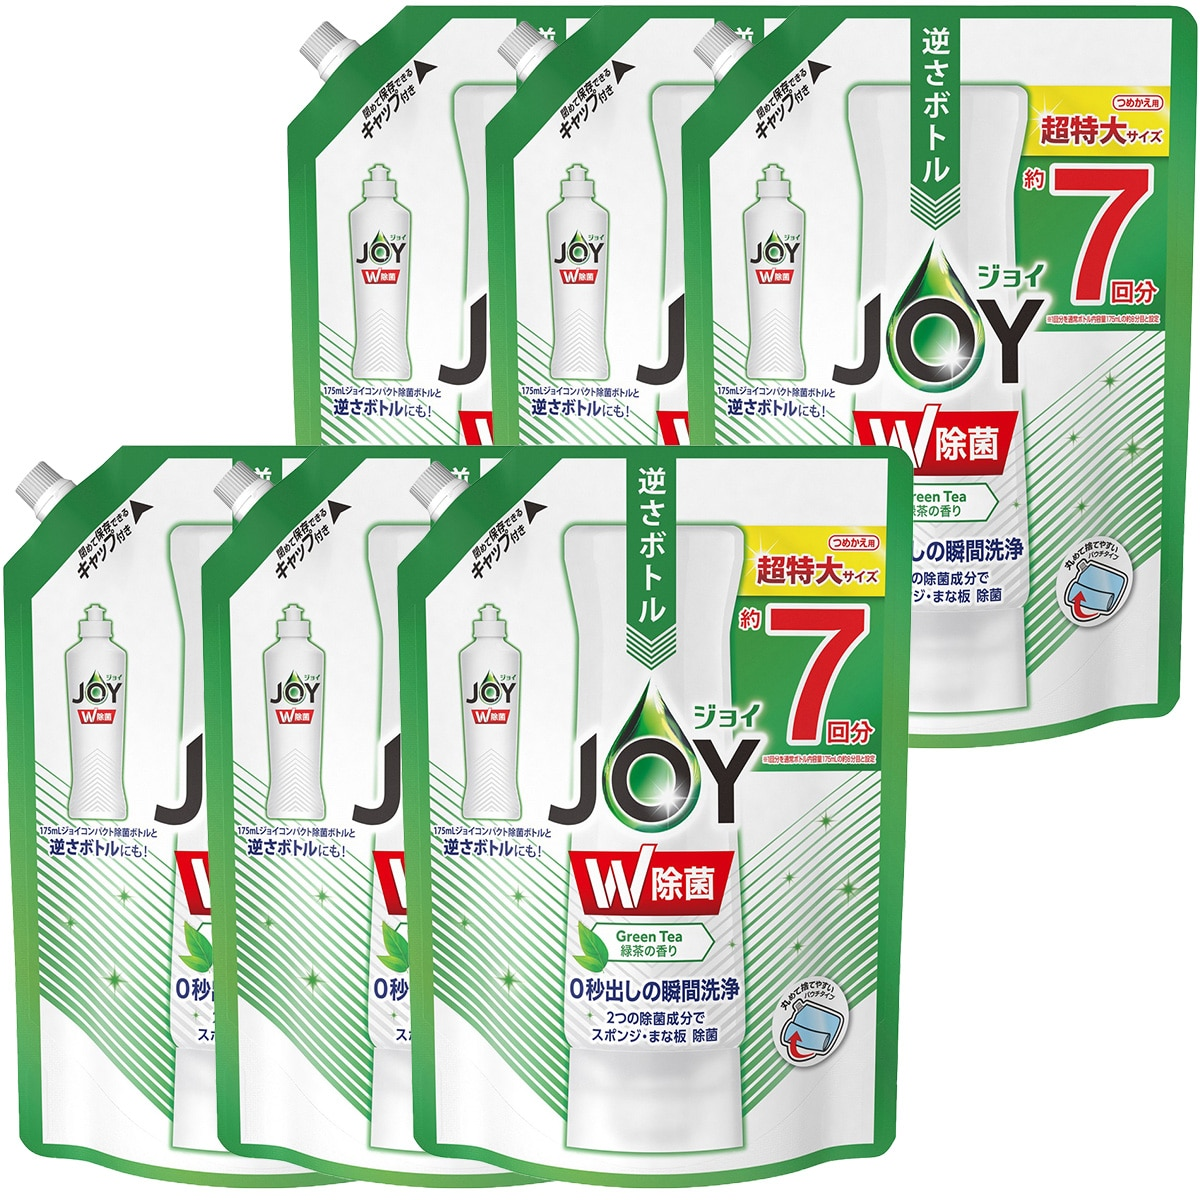 P&G 除菌ジョイ コンパクト 食器用洗剤 緑茶の香り 超特大 960mL×6本